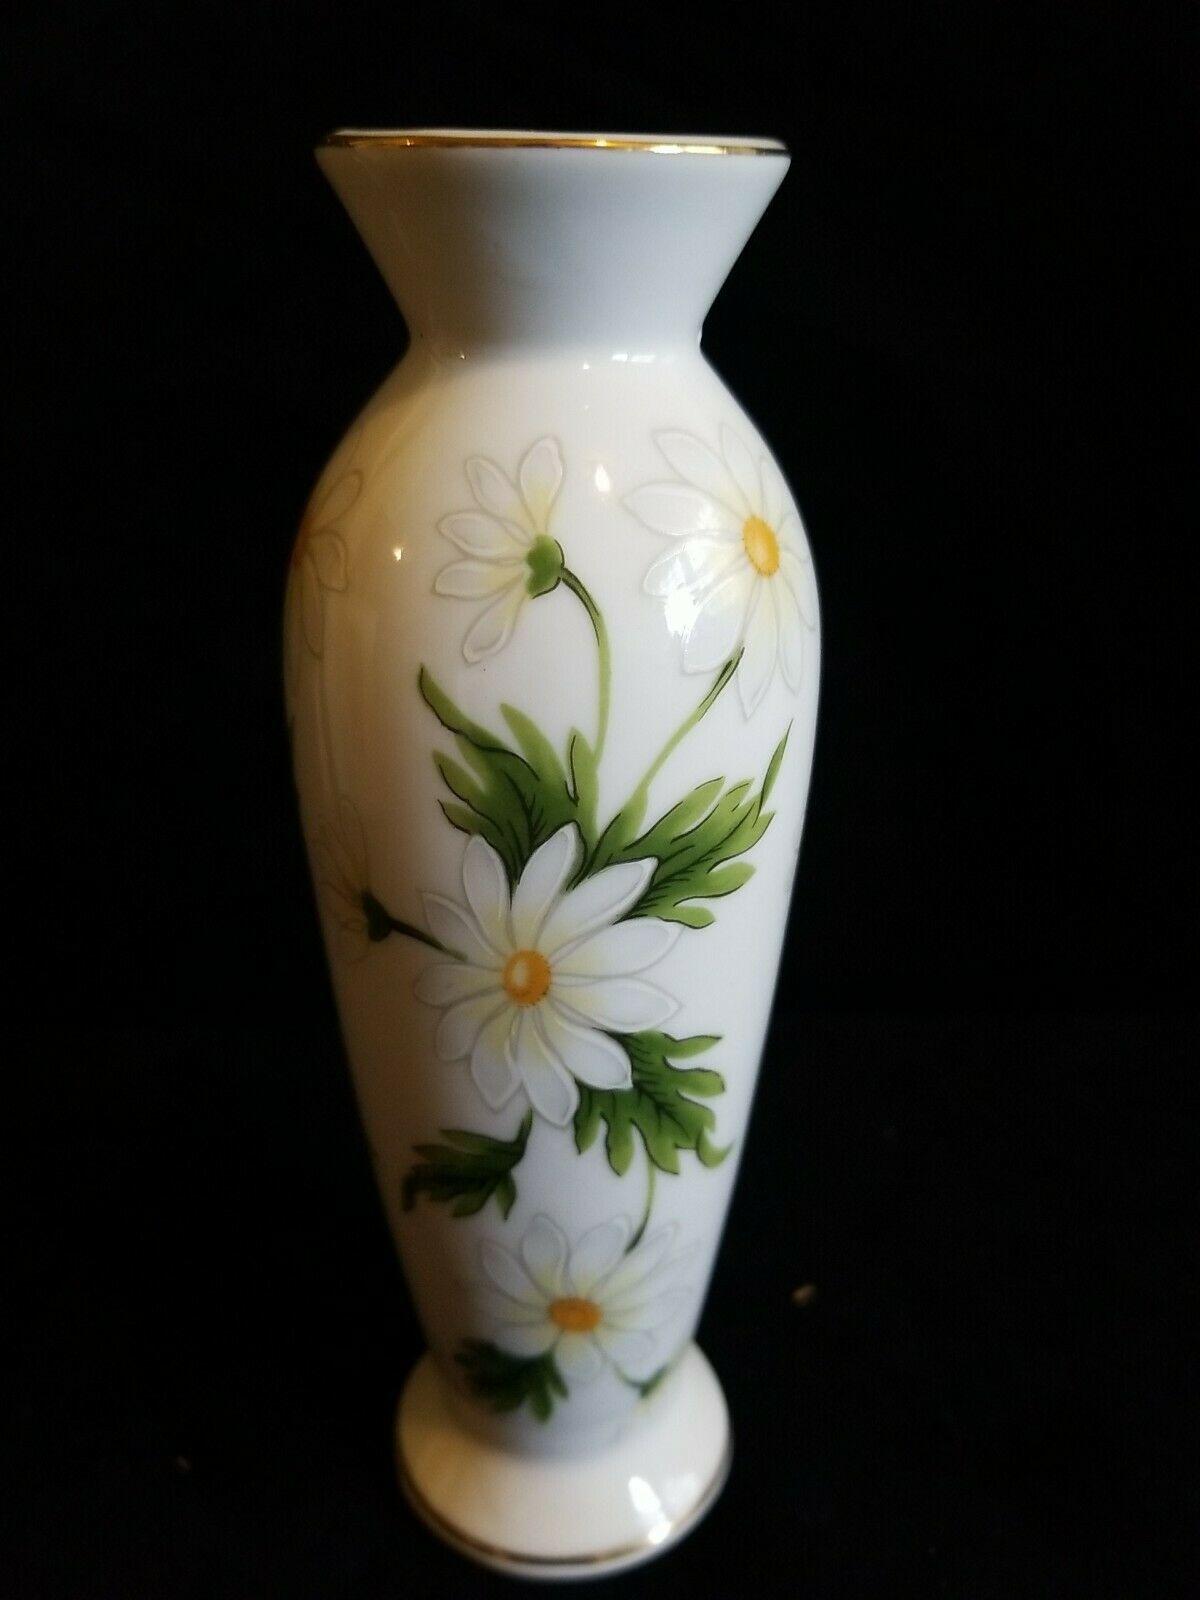 Lefton Vintage Daisy Bud Vase. Made In Japan. Marked Lefton 1367. - $10.19